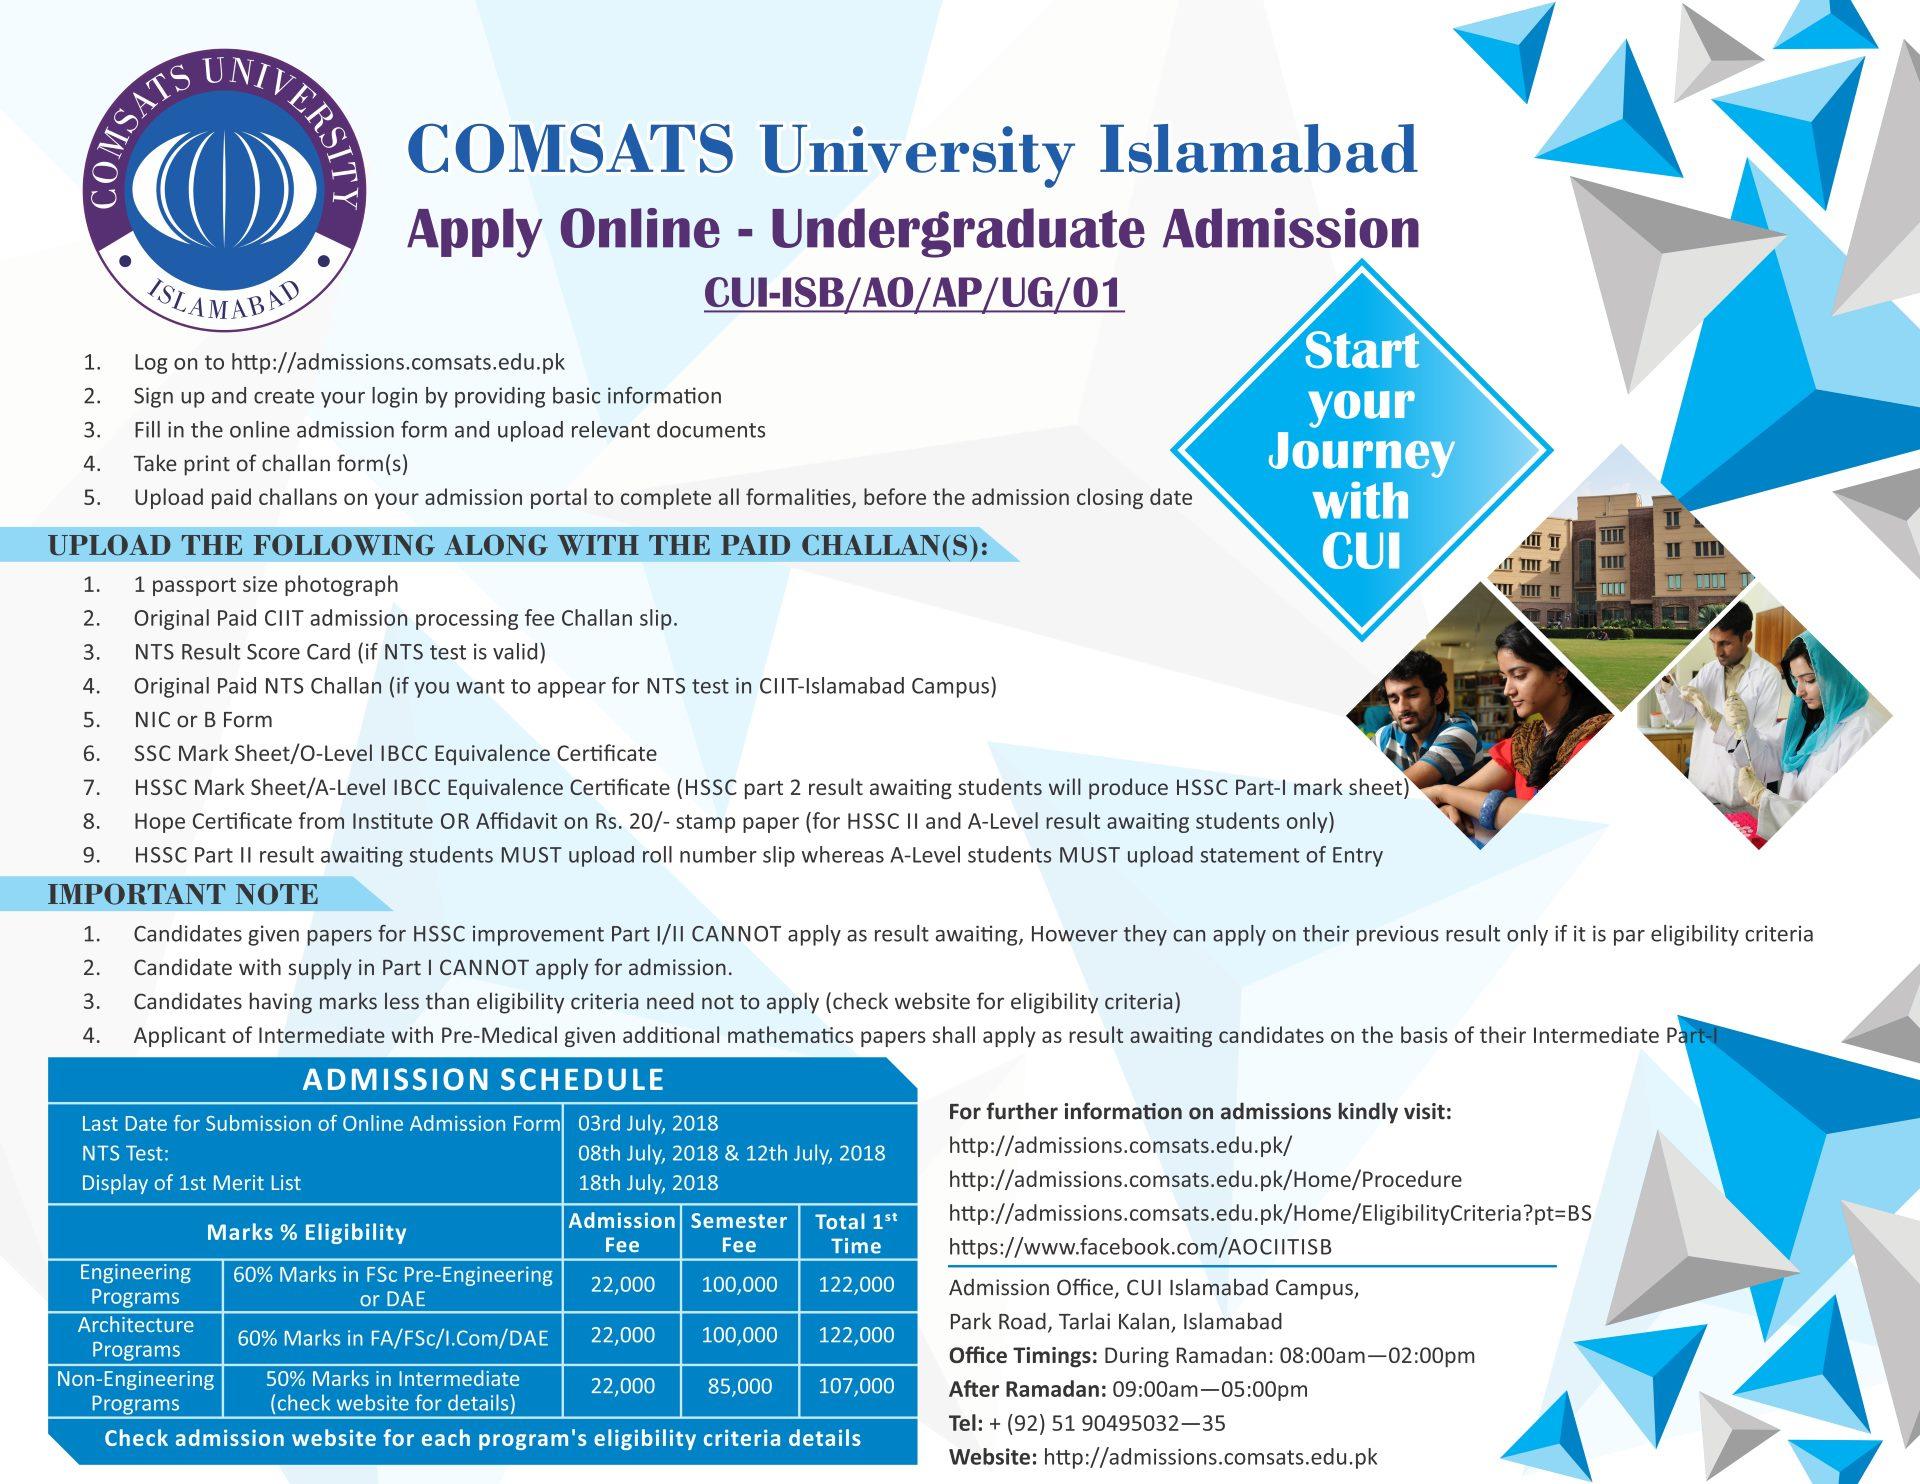 COMSATS University Islamabad Apply Online Undergraduate Admission